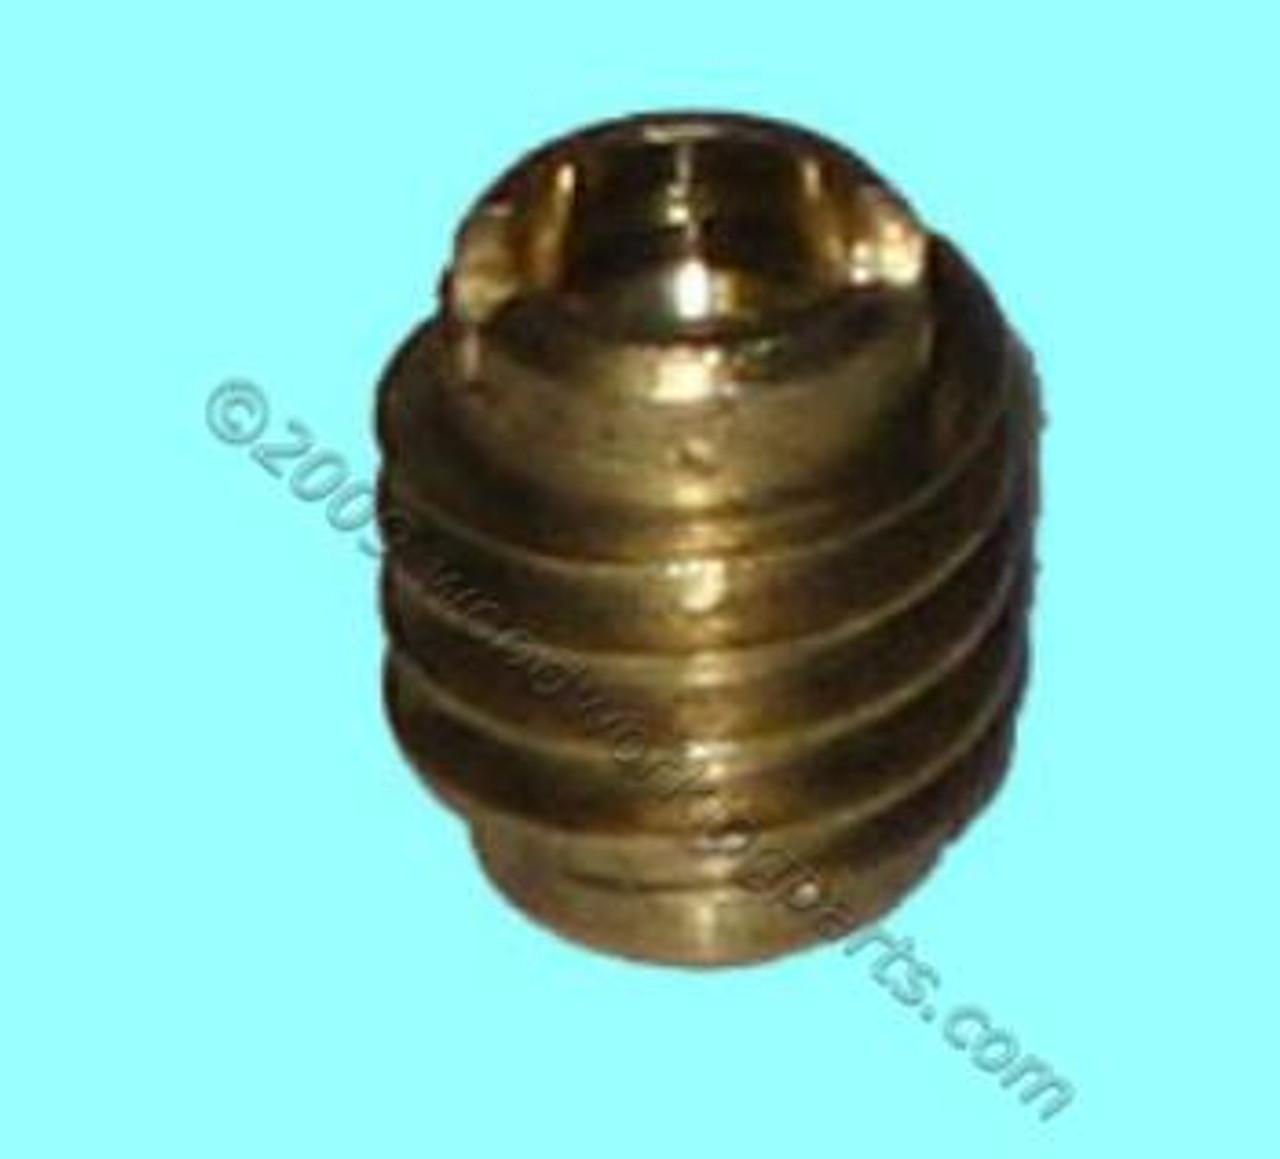 5 MM Metric Brass Threaded Insert